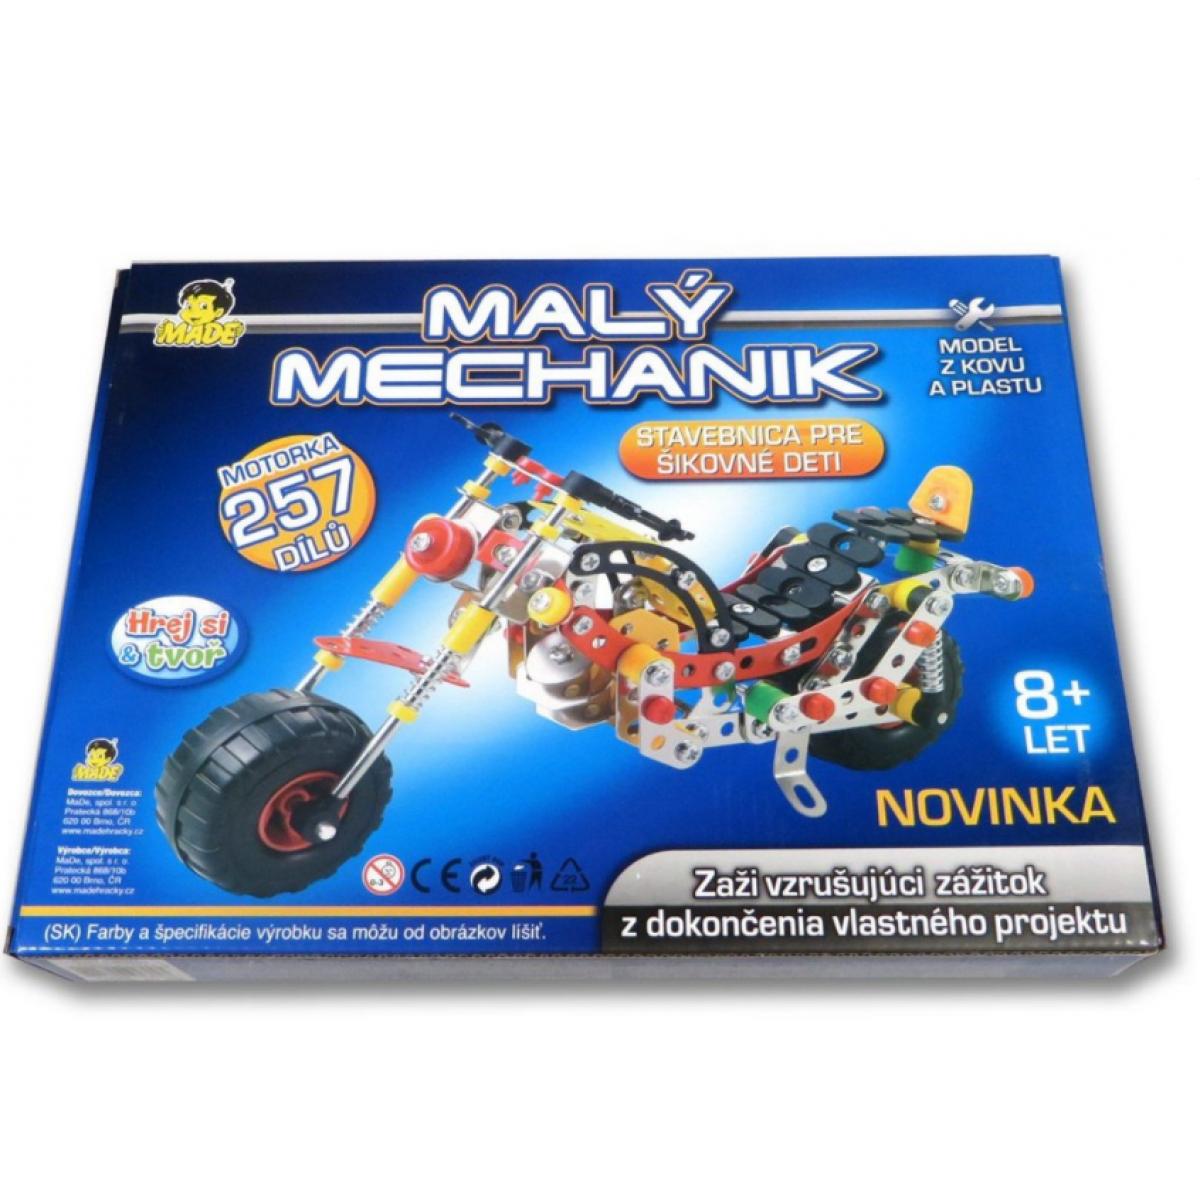 Made Malý mechanik motorka